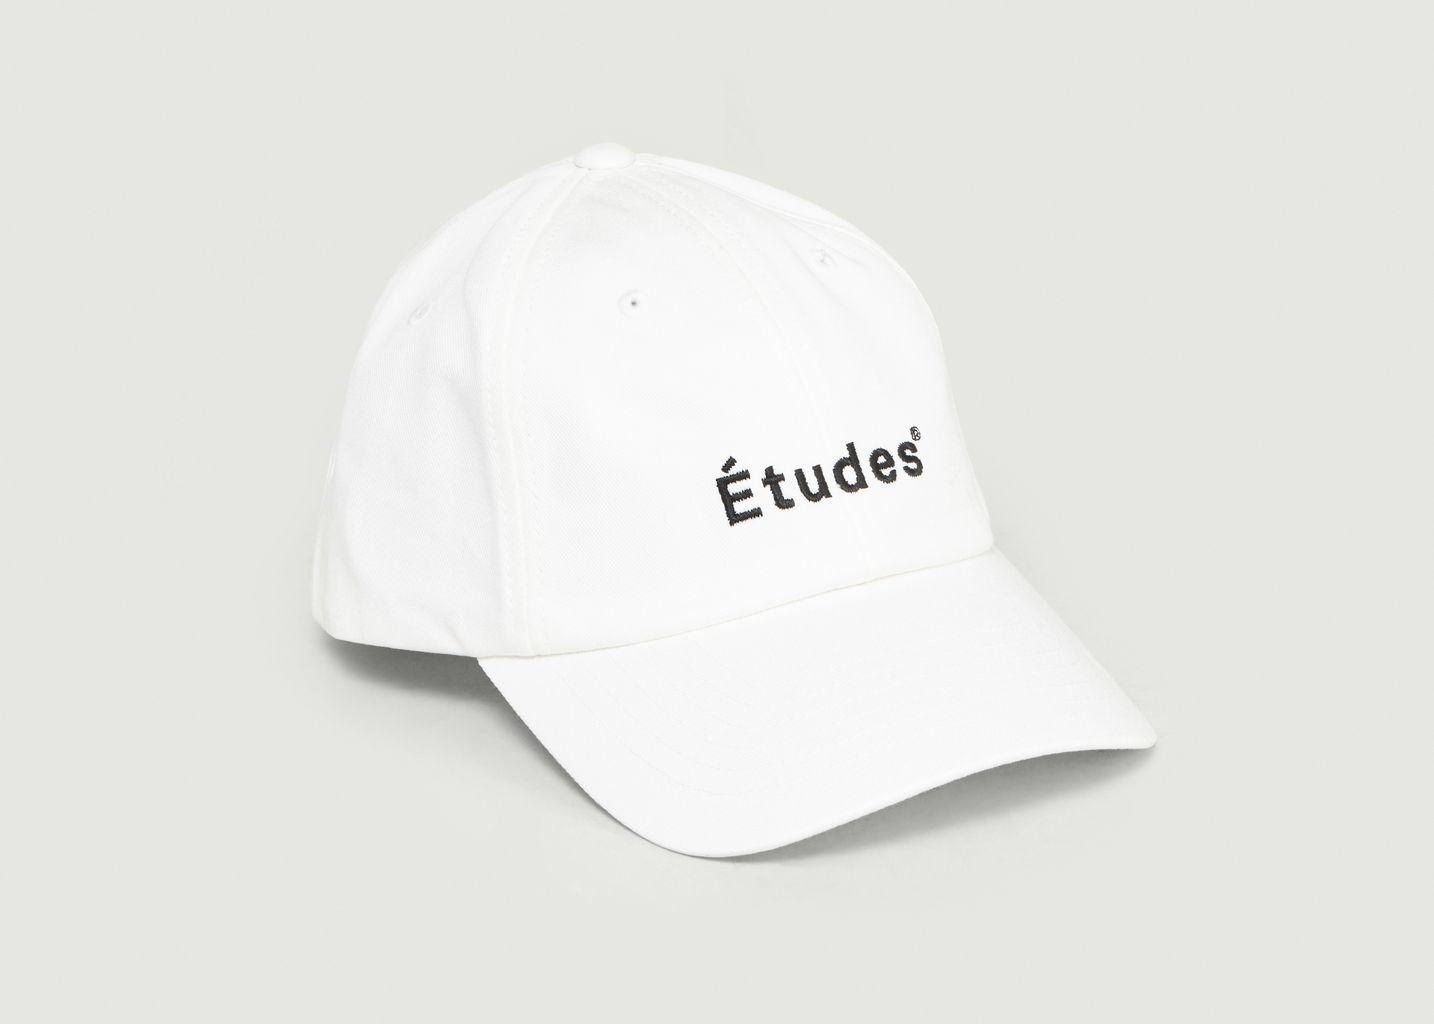 Tuff Études - Études